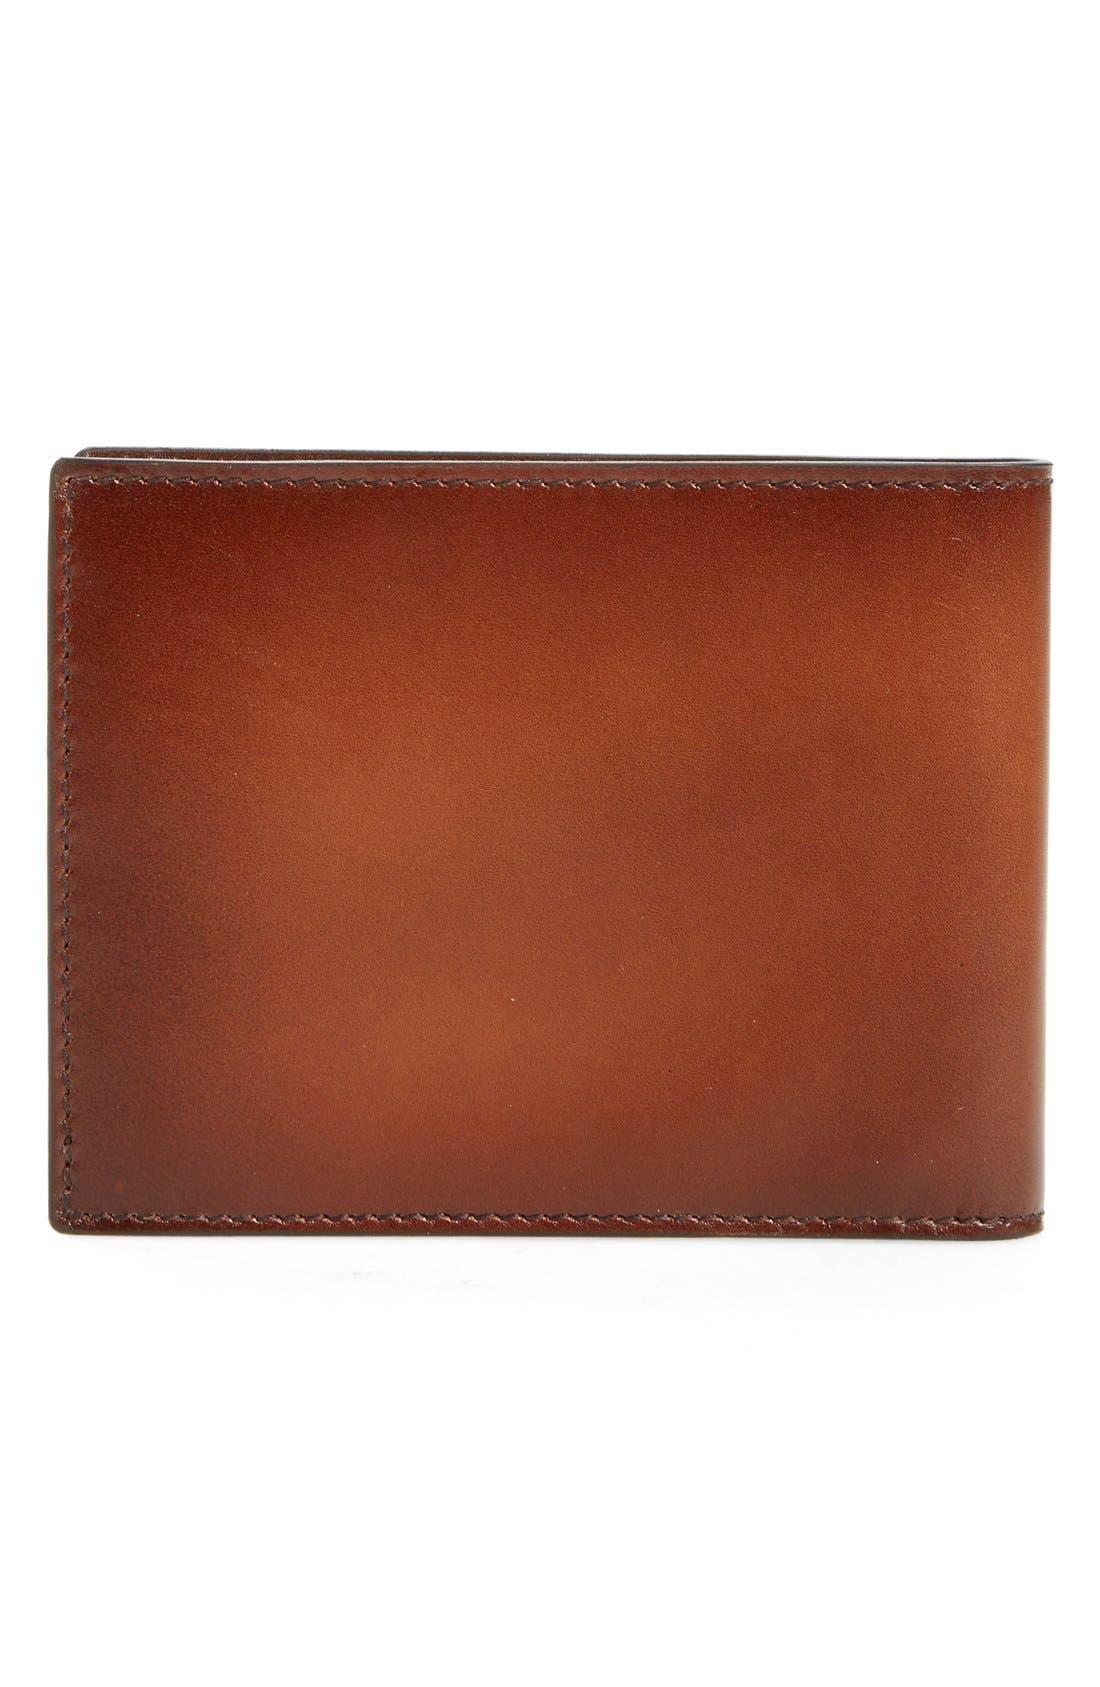 Alternate Image 3  - Salvatore Ferragamo Bifold Leather Wallet